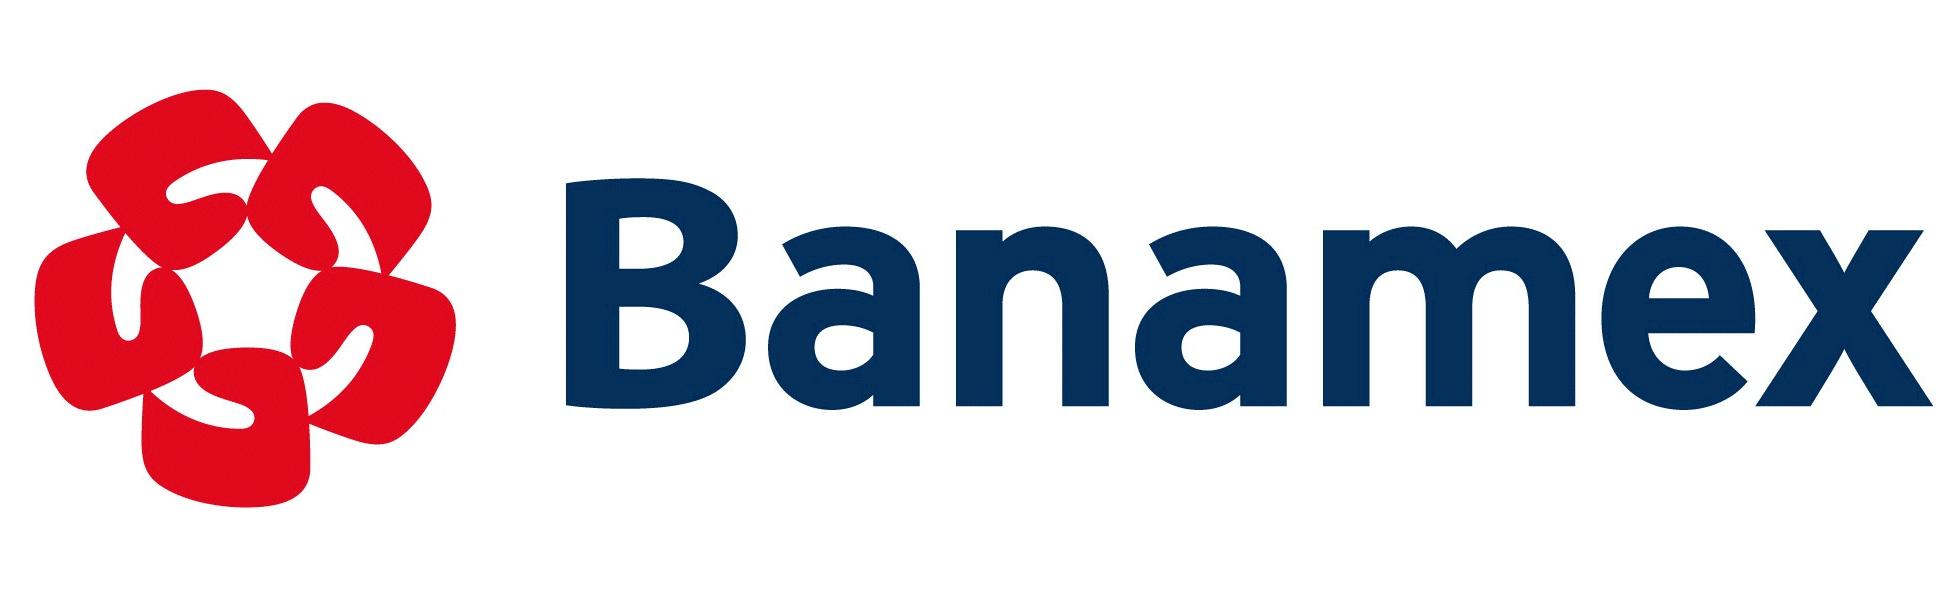 https://0201.nccdn.net/1_2/000/000/16c/394/banamex-logo.png